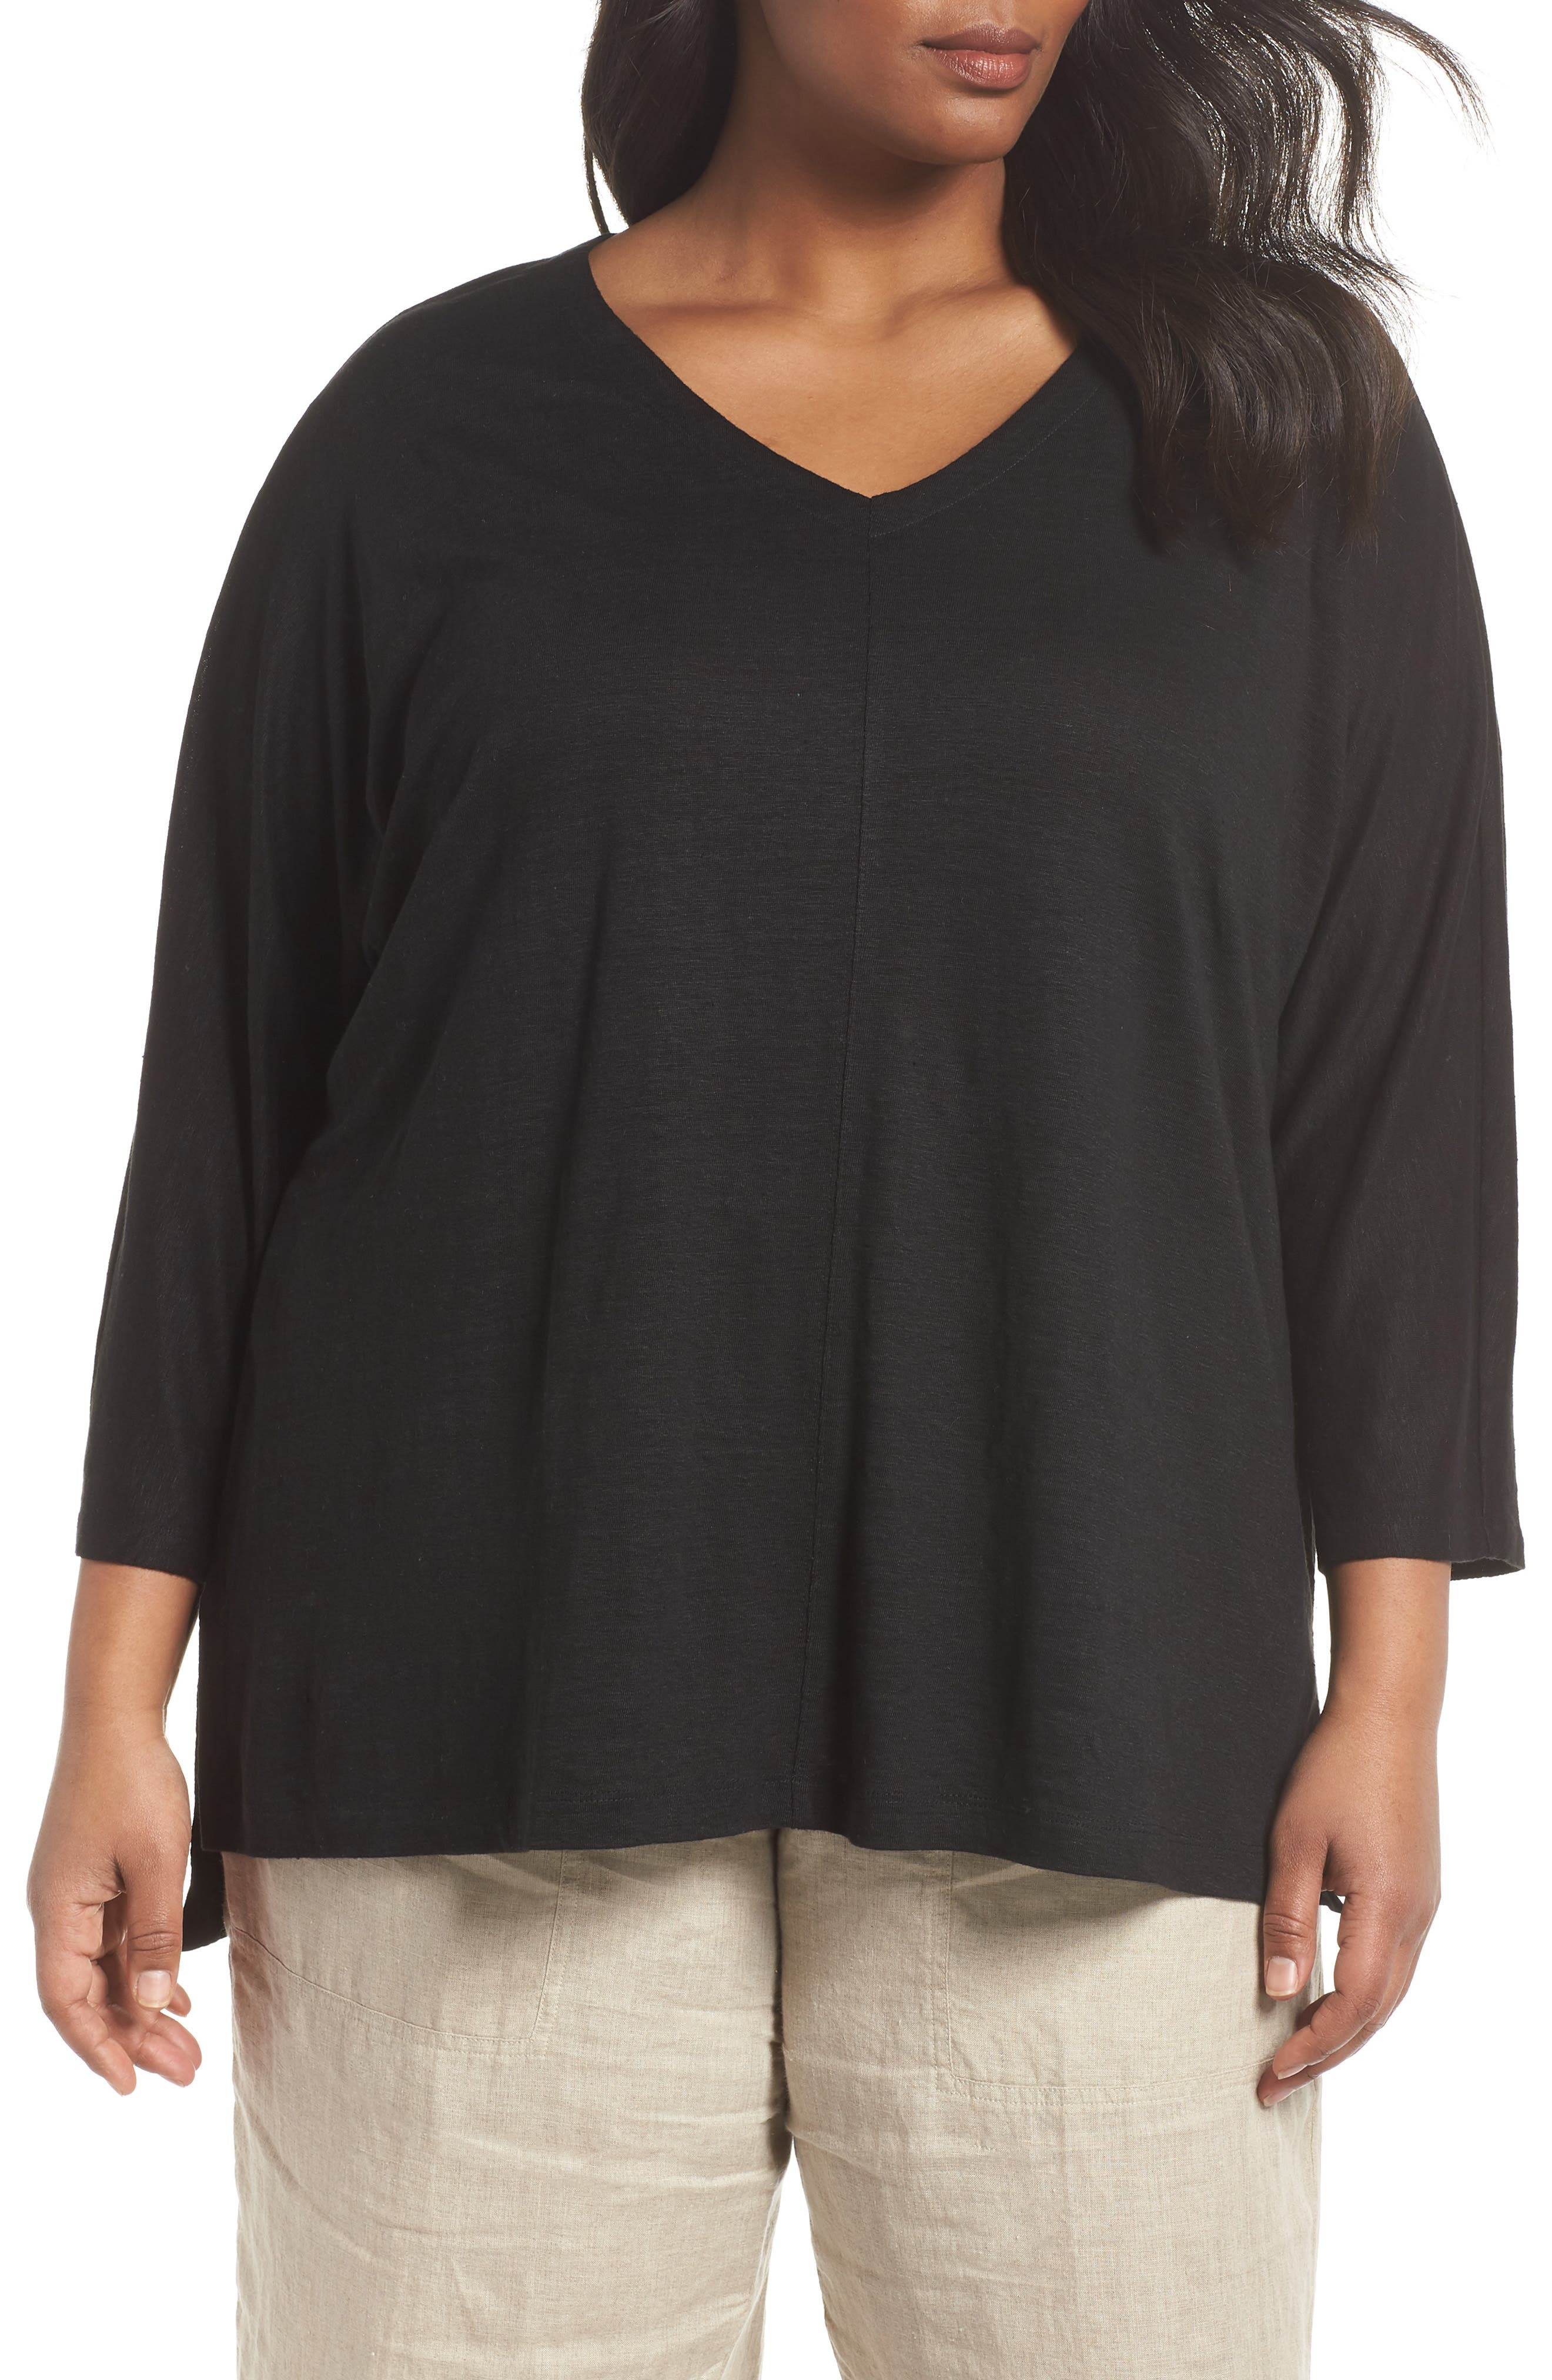 Main Image - Eileen Fisher Organic Linen Top (Plus Size)